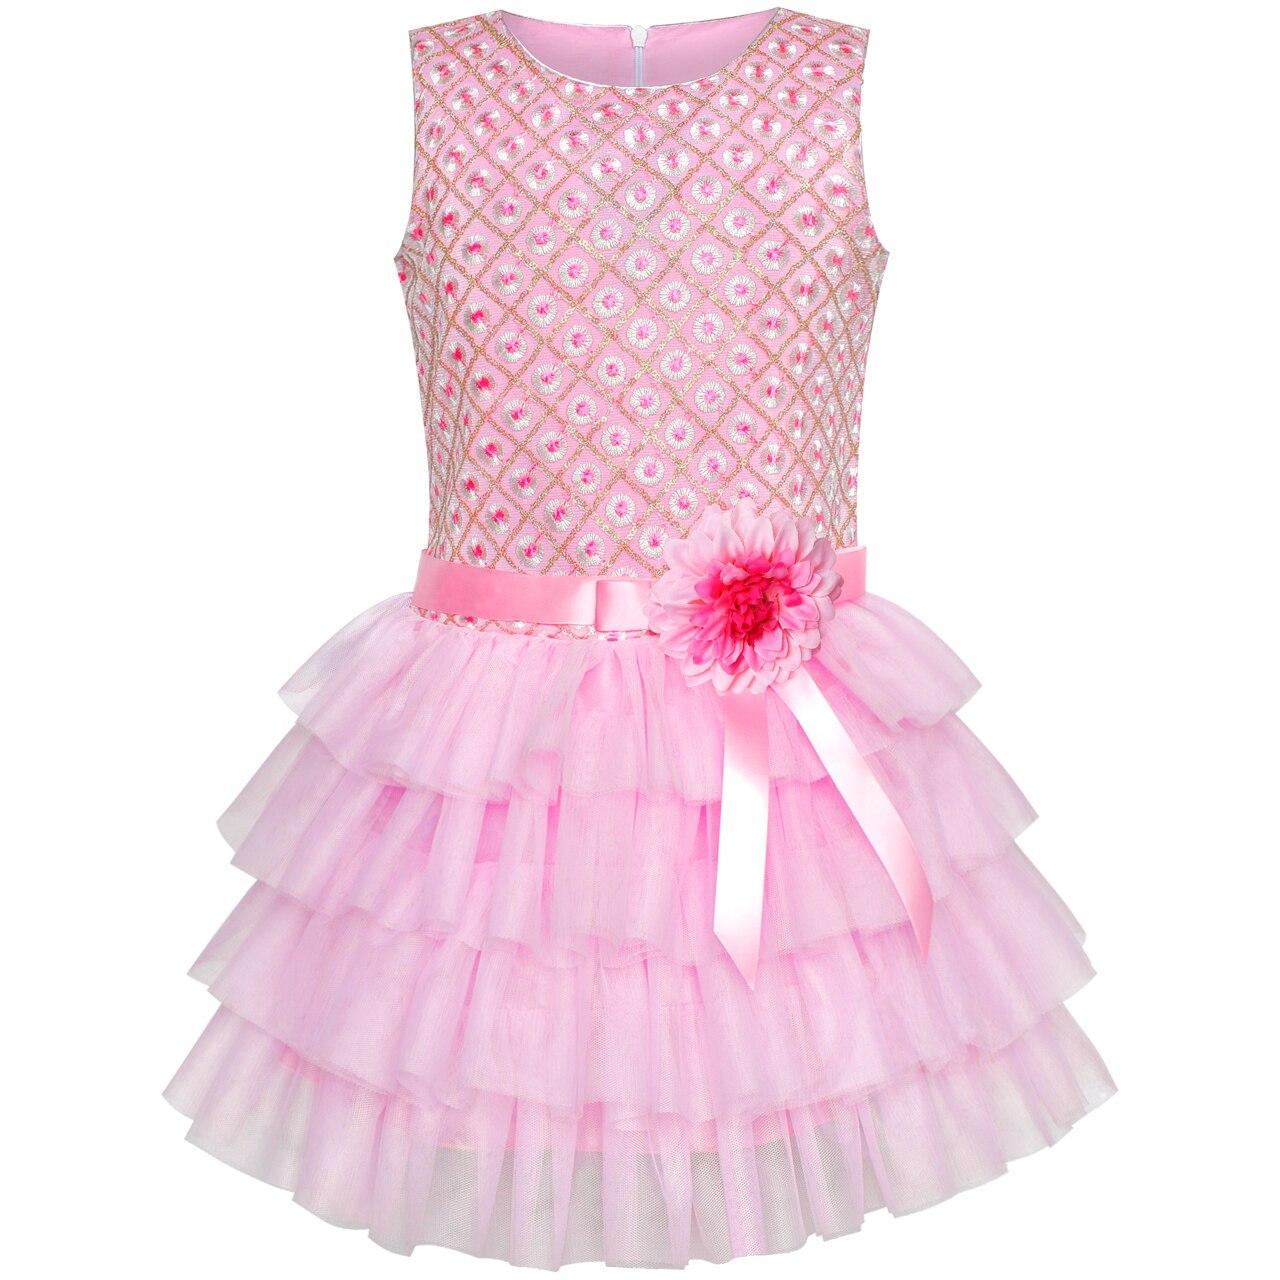 Girls Dress Ruffle Pink Flower Birthday Party 2019 Summer Princess Wedding Dresses Children Clothes Pageant Sundress